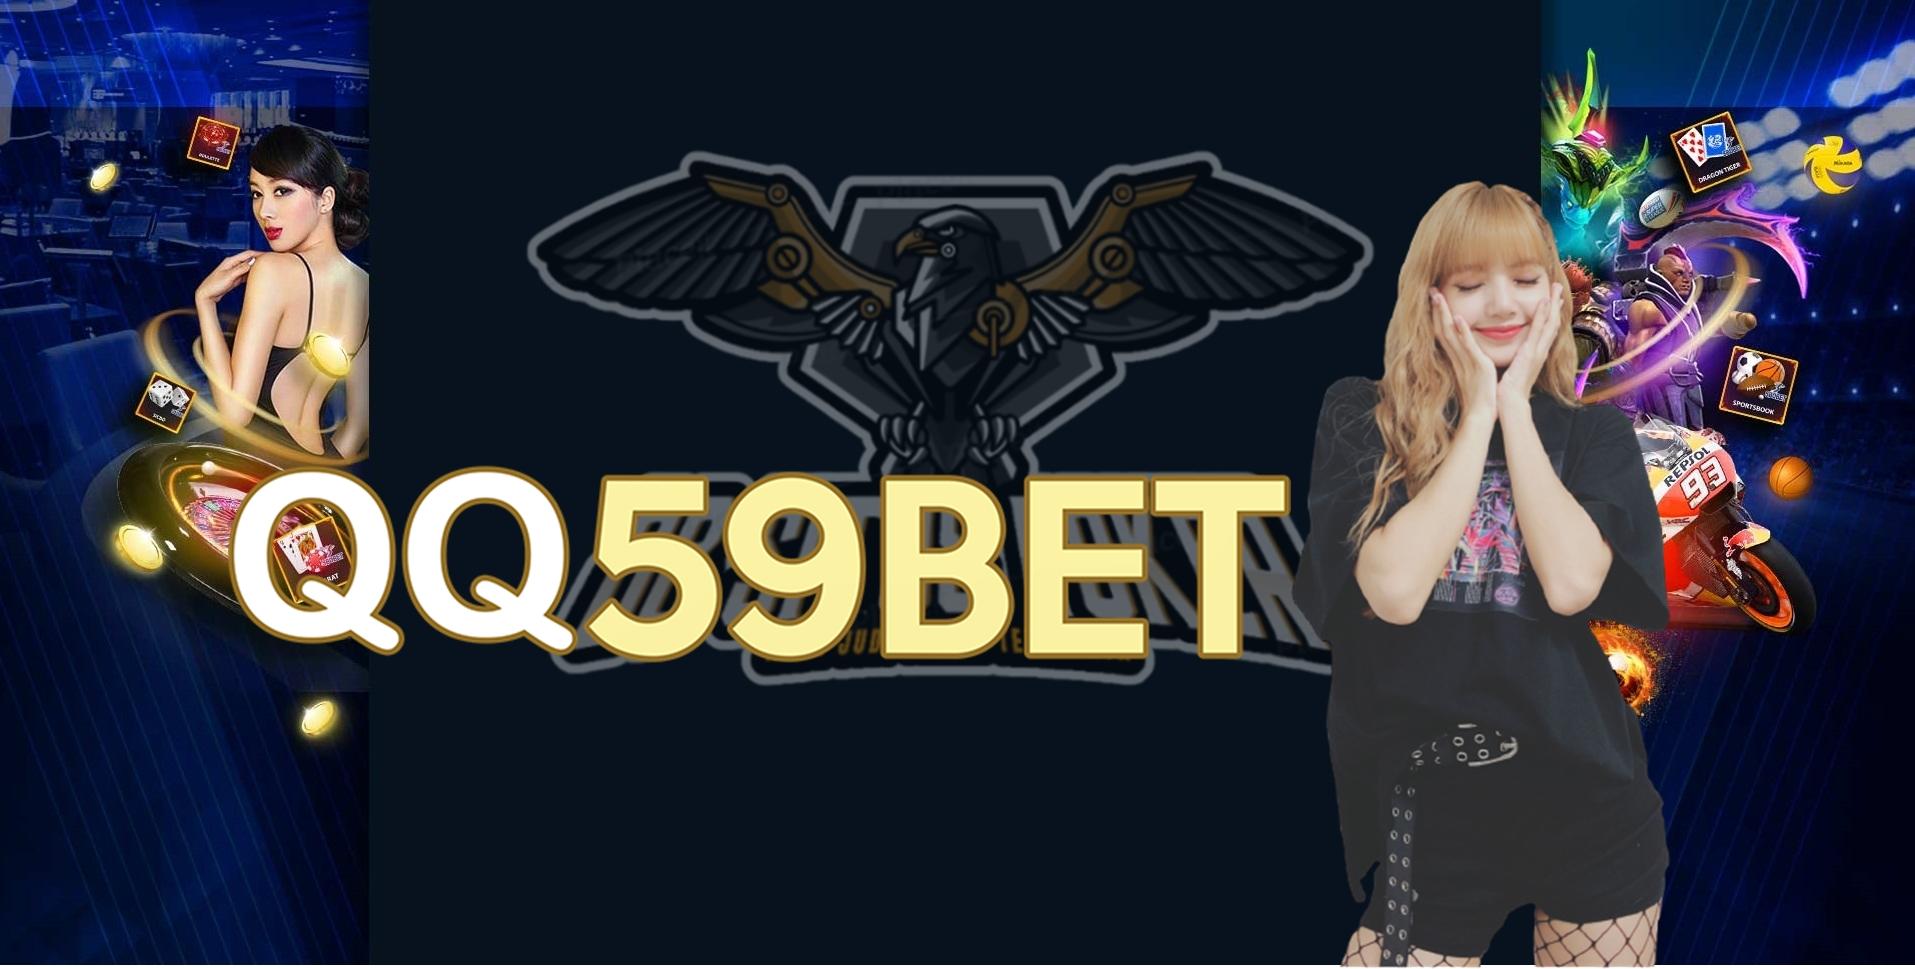 QQ59bet Agen Judi Slot Online Terpercaya Di Indonesia